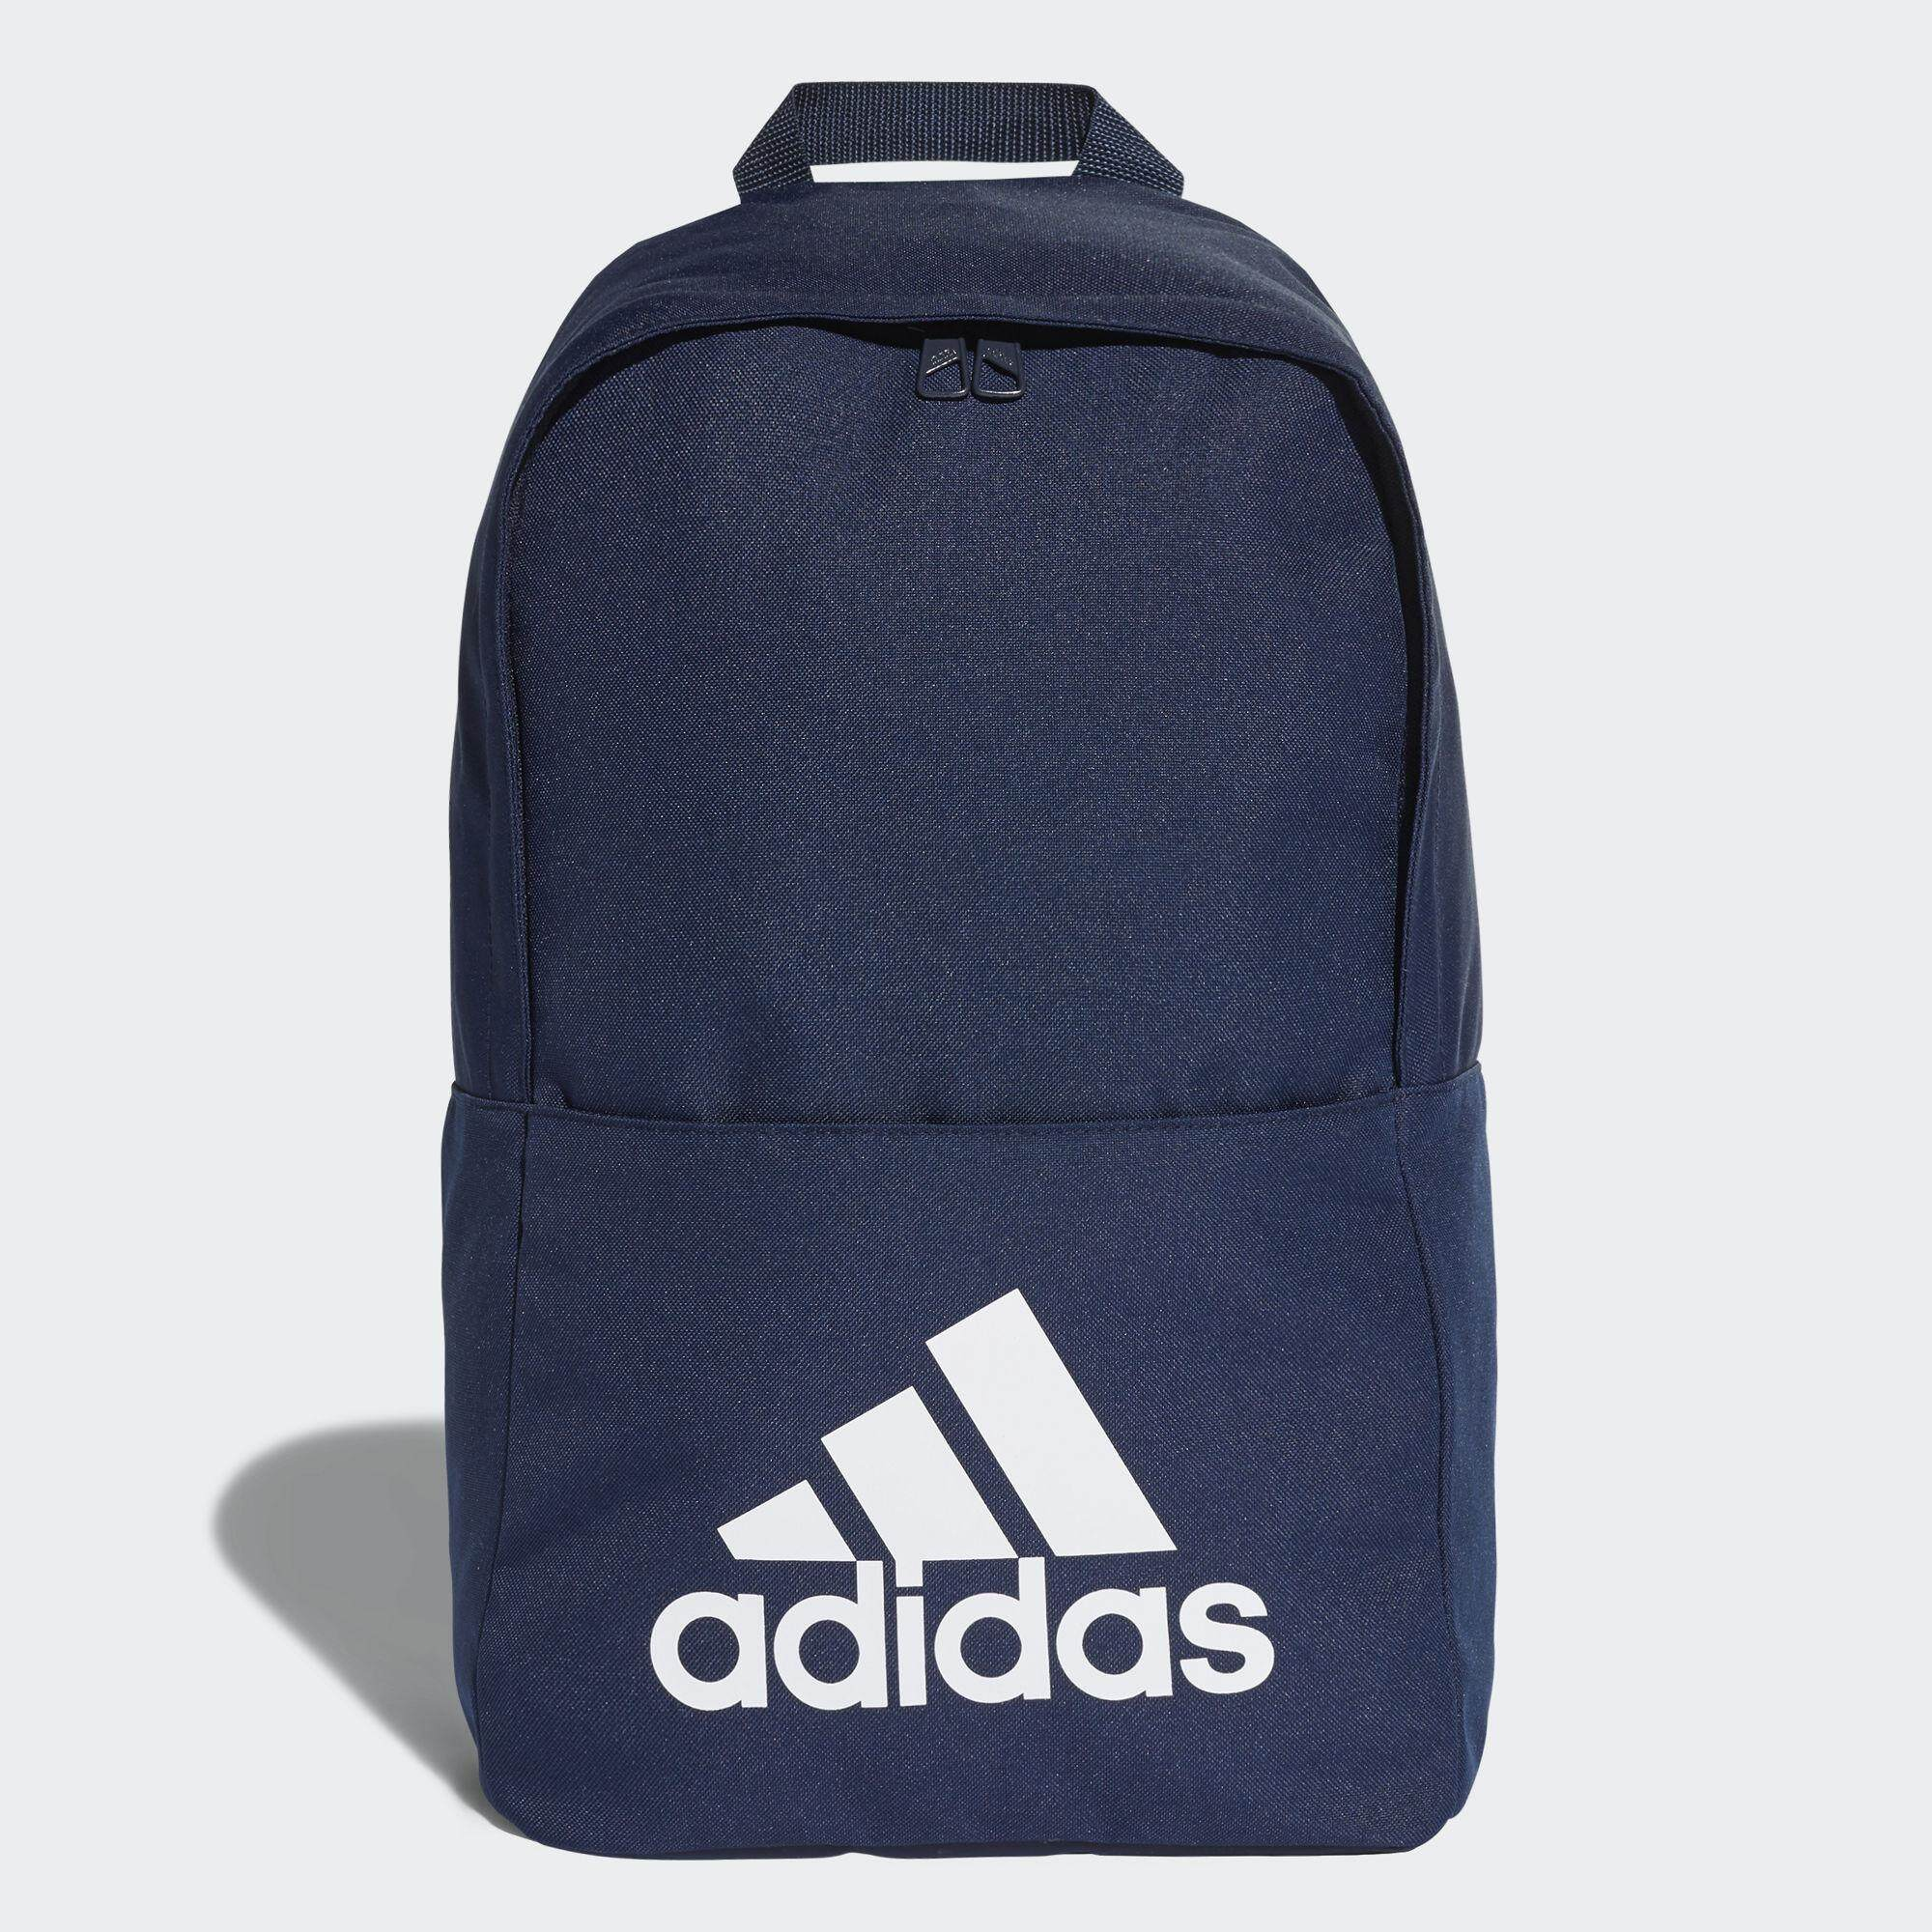 e5870d00e8cb KOZO ++ ADIDAS ร้อนนี้ได้กระเป๋าใส่เที่ยวรึยัง กระเป๋าเป้ ADIDAS รุ่น